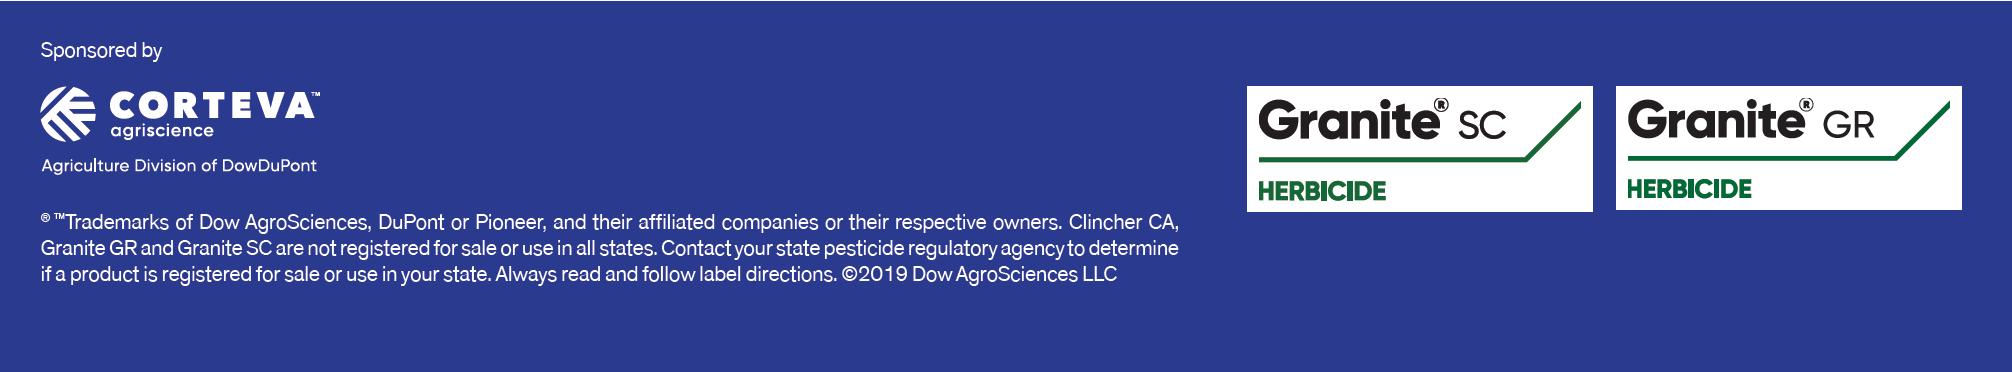 Corteva Rice Advice disclaimer california